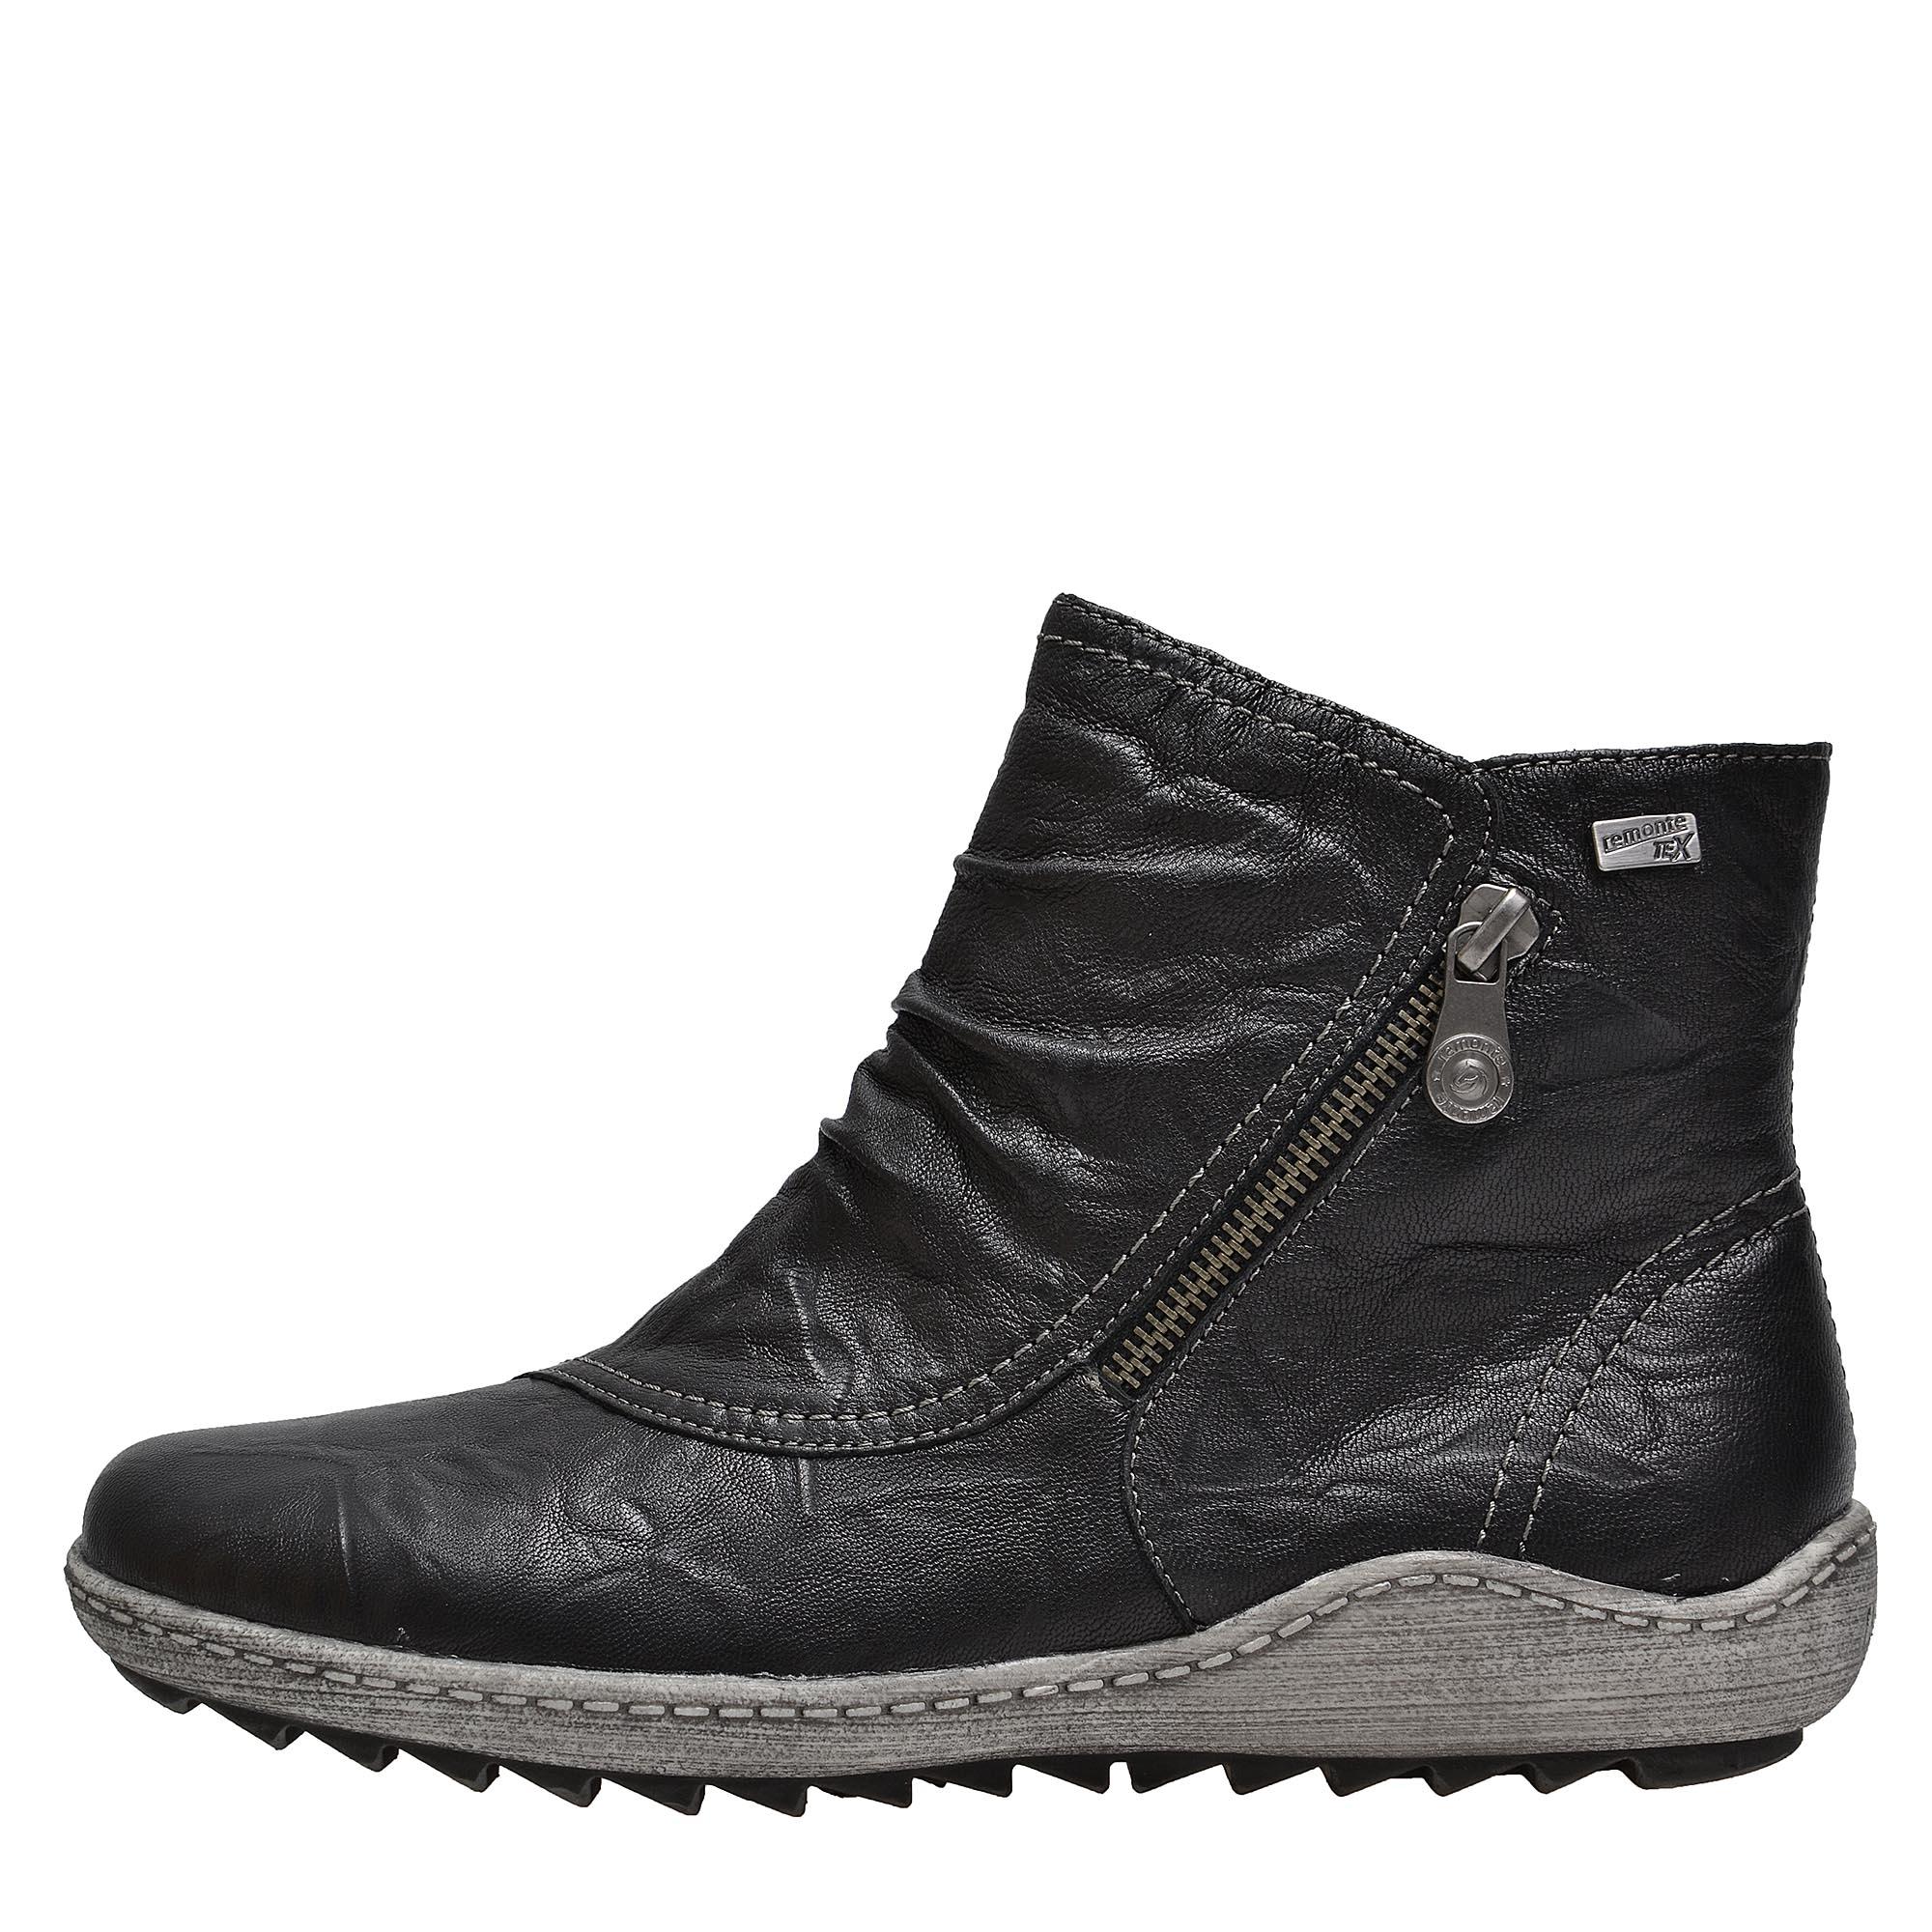 Dámská obuv RIEKER - REMONTER1475 01 SCHWARZ H W 8  347a2f04b3b